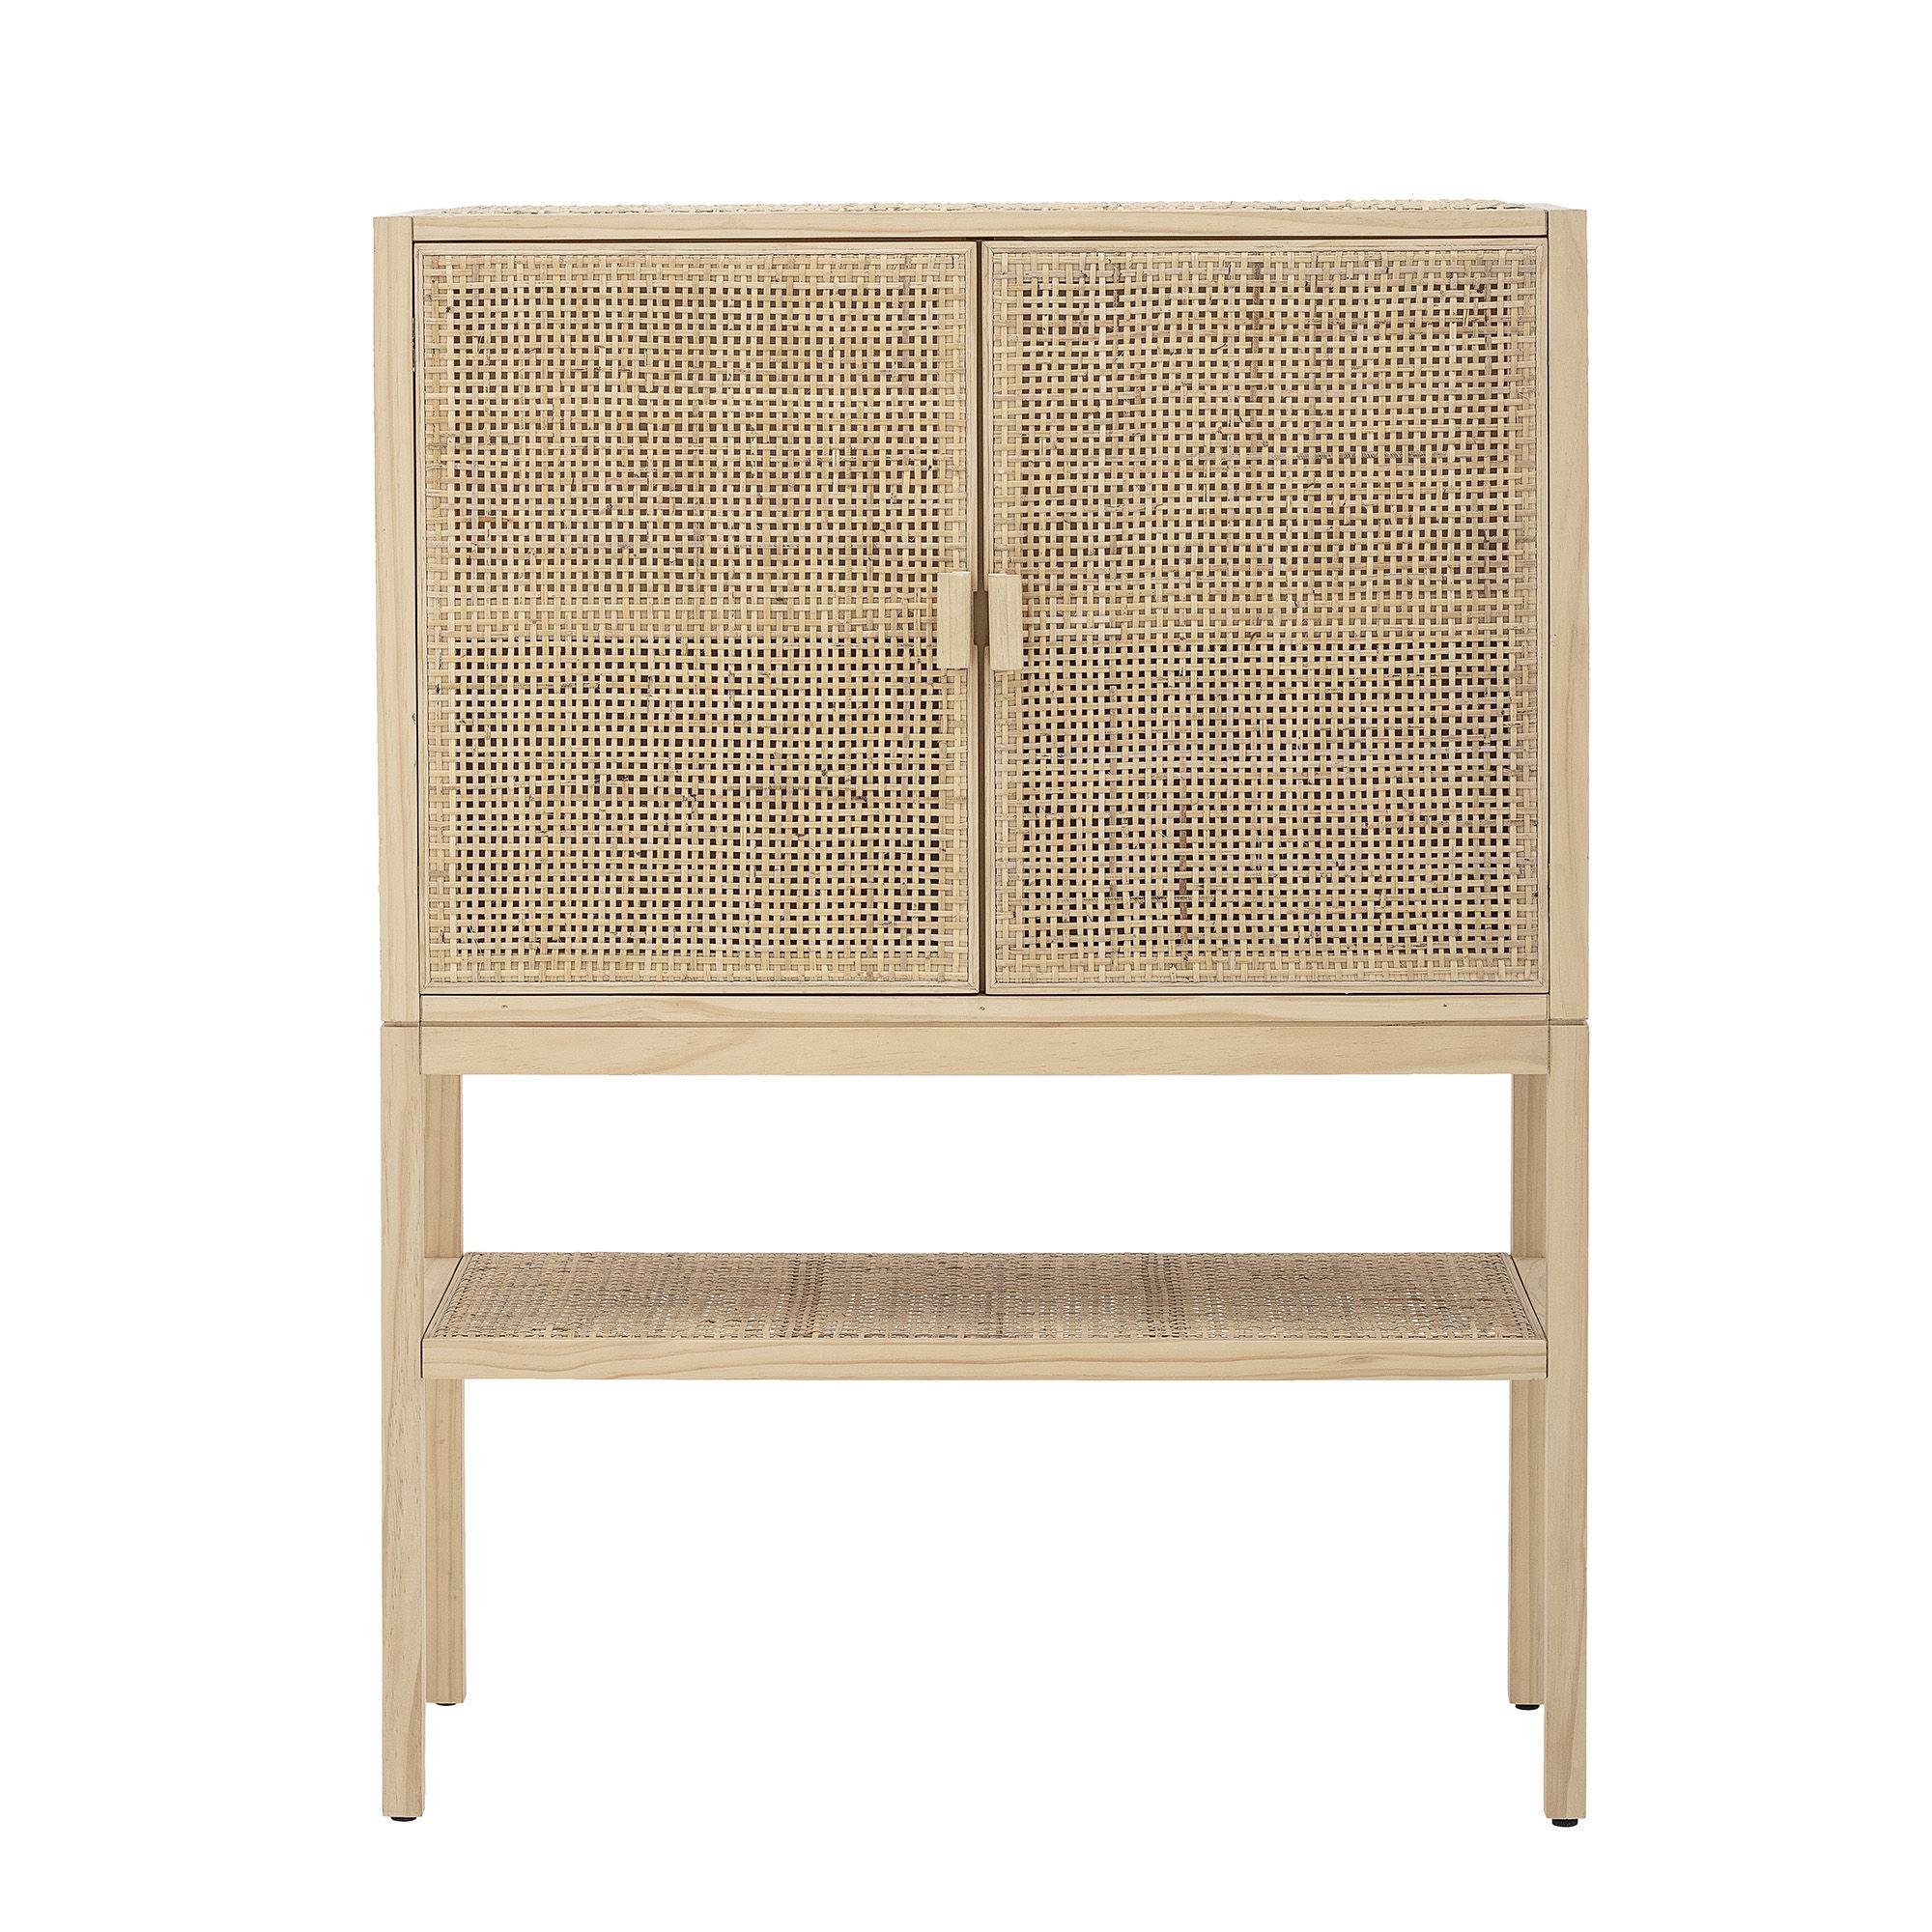 Furniture - Bookcases & Bookshelves - Sanna High dresser - / L 90 x H 120 cm - Rattan canework by Bloomingville - Natural - MDF, Pine plywood, Rattan